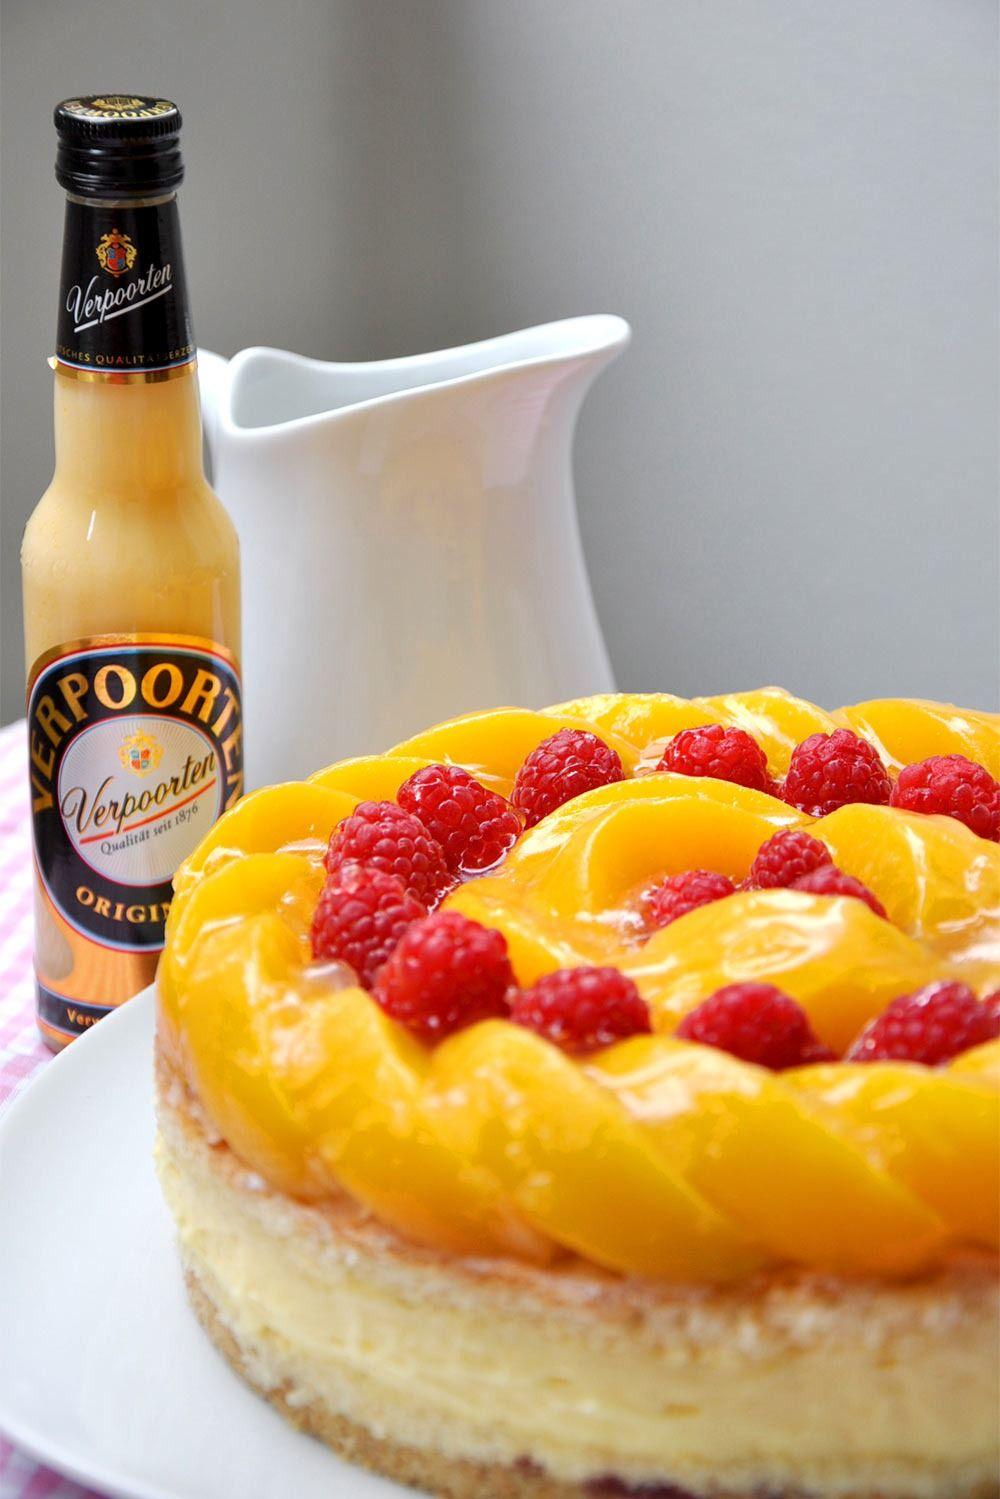 Photo of Pfirsich-Himbeer-Eierlikör Verpoorten-Torte